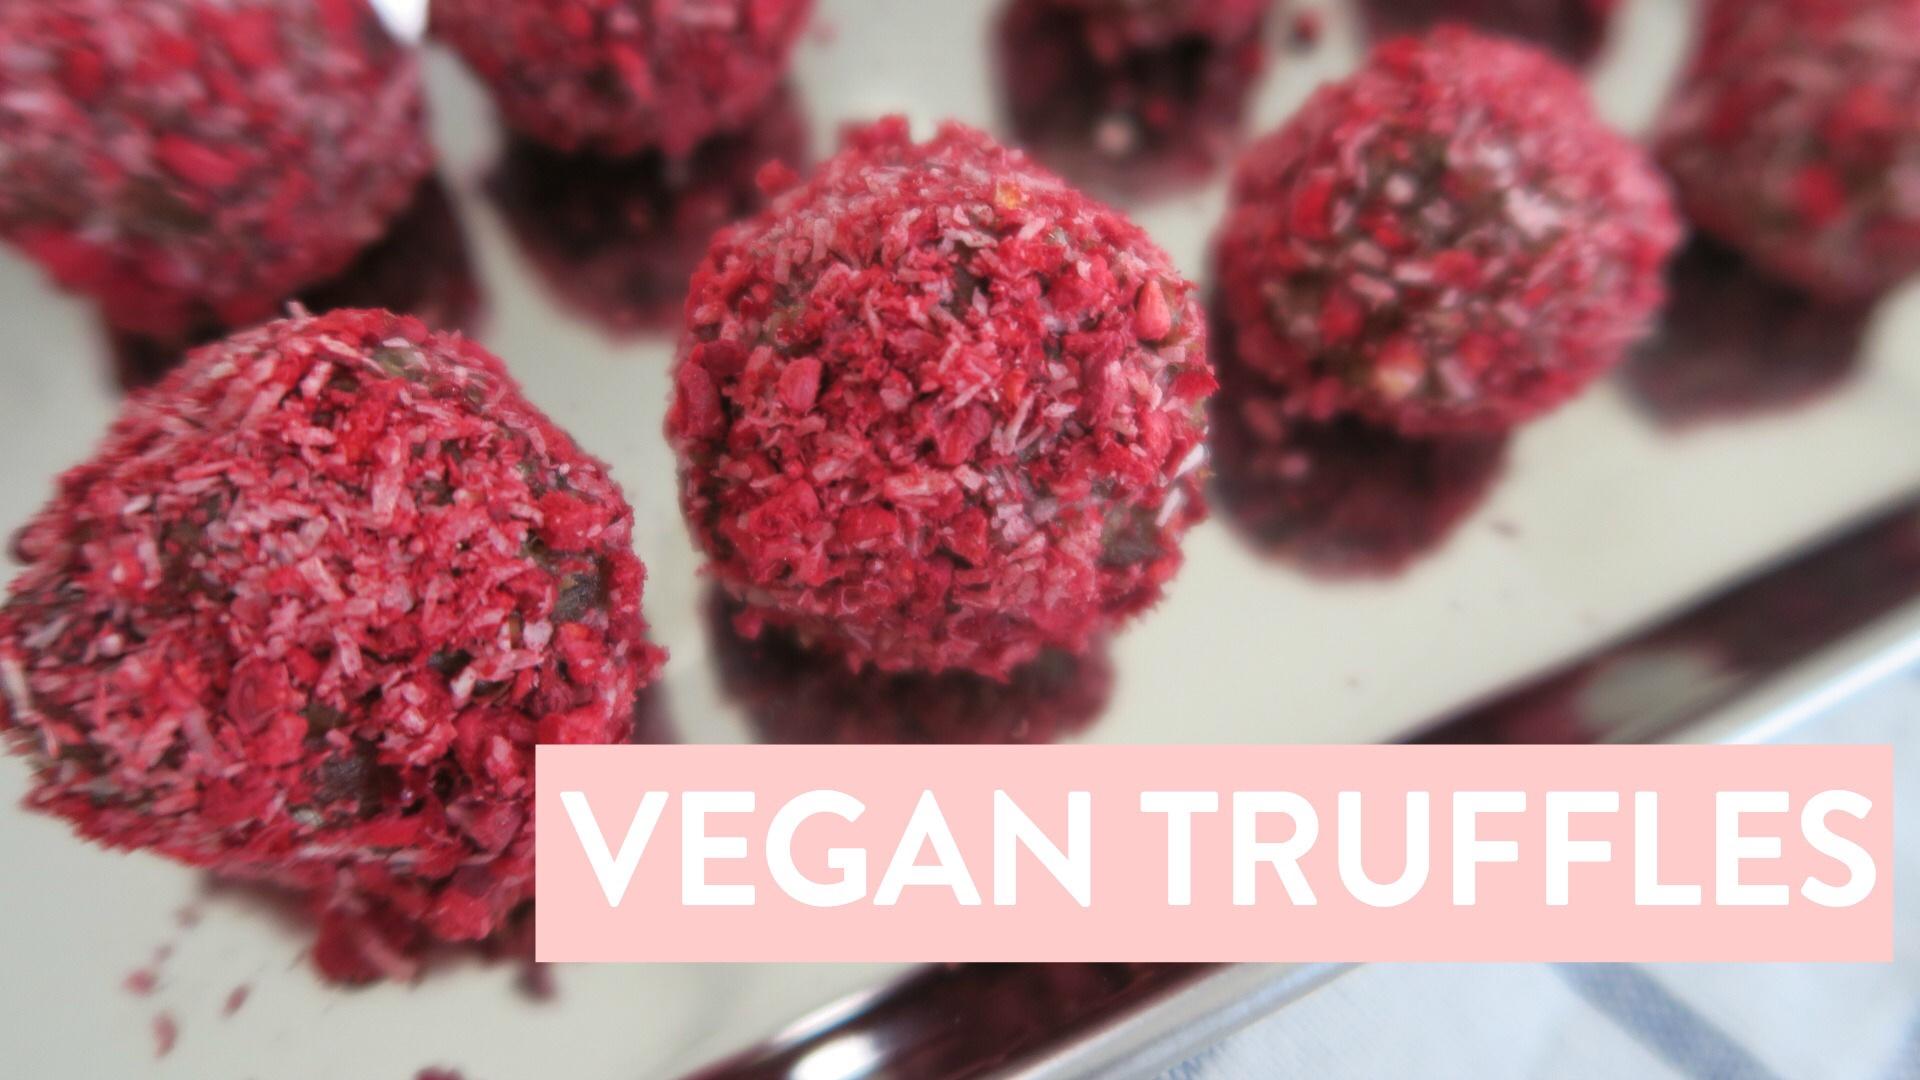 Raw Vegan Truffle Recipe for Valentine's Day